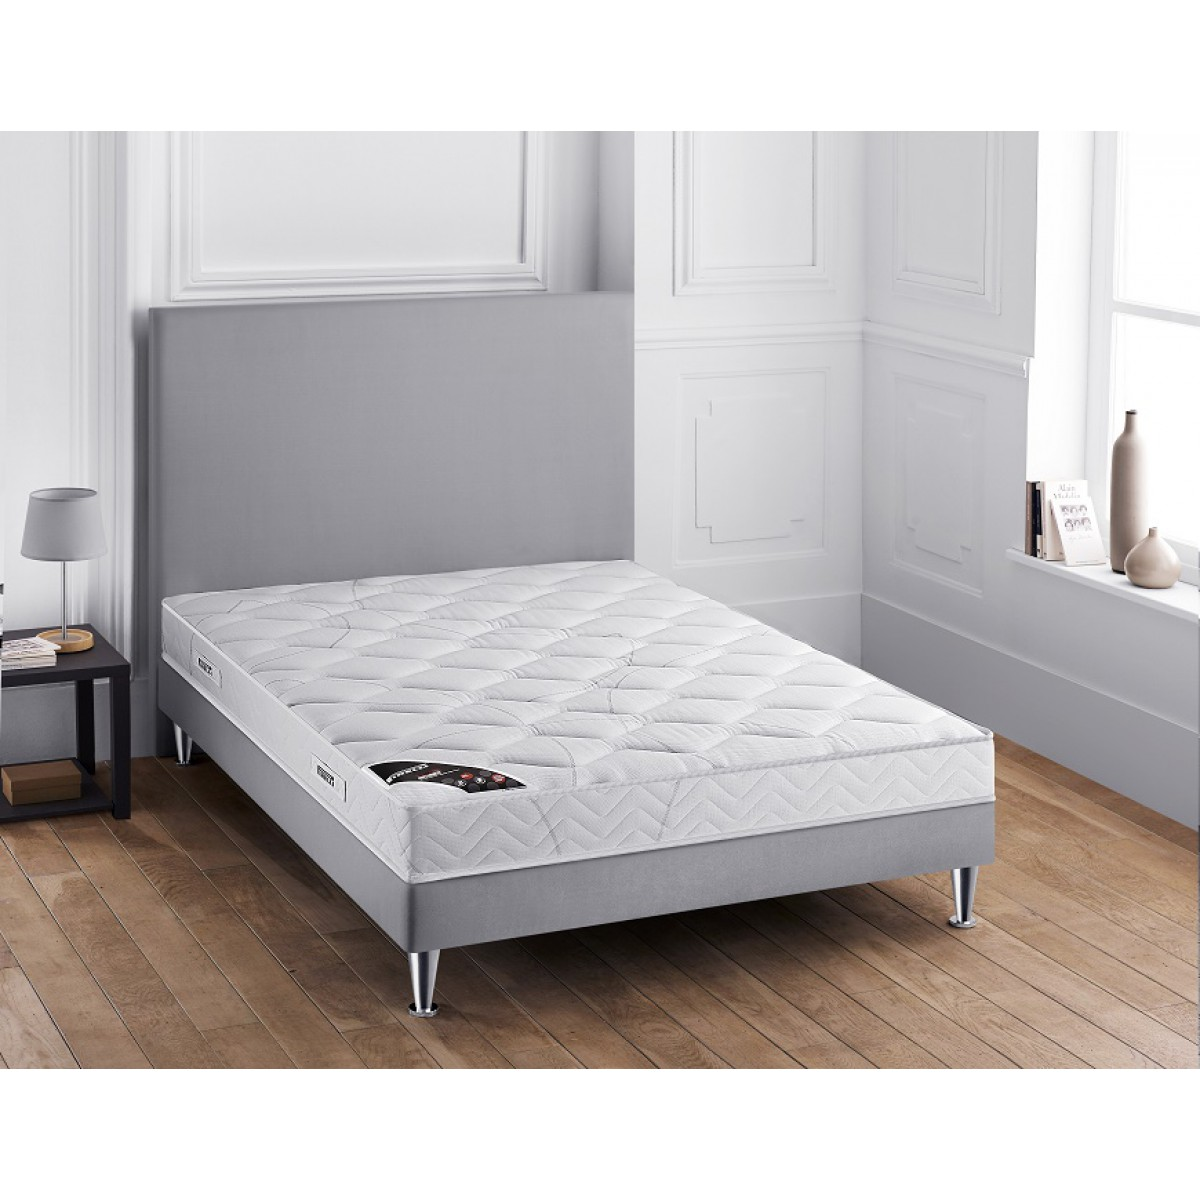 pirelli dunlopillo matelas physial b 120x190 latex. Black Bedroom Furniture Sets. Home Design Ideas